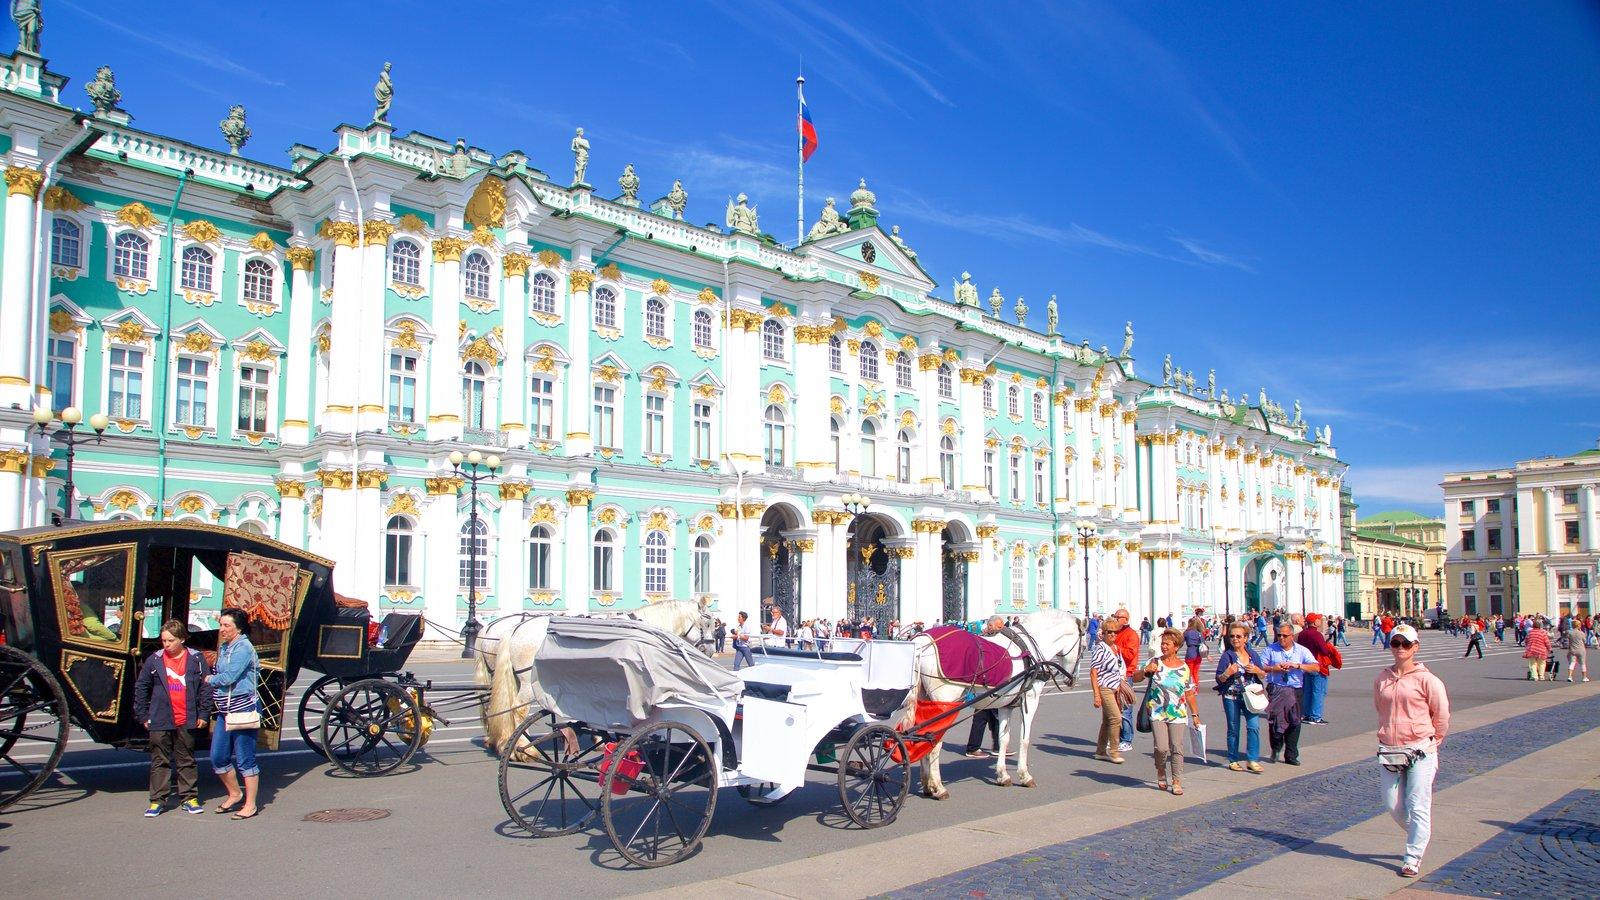 Hermitage caracterizando arquitetura de patrimônio e cenas de rua